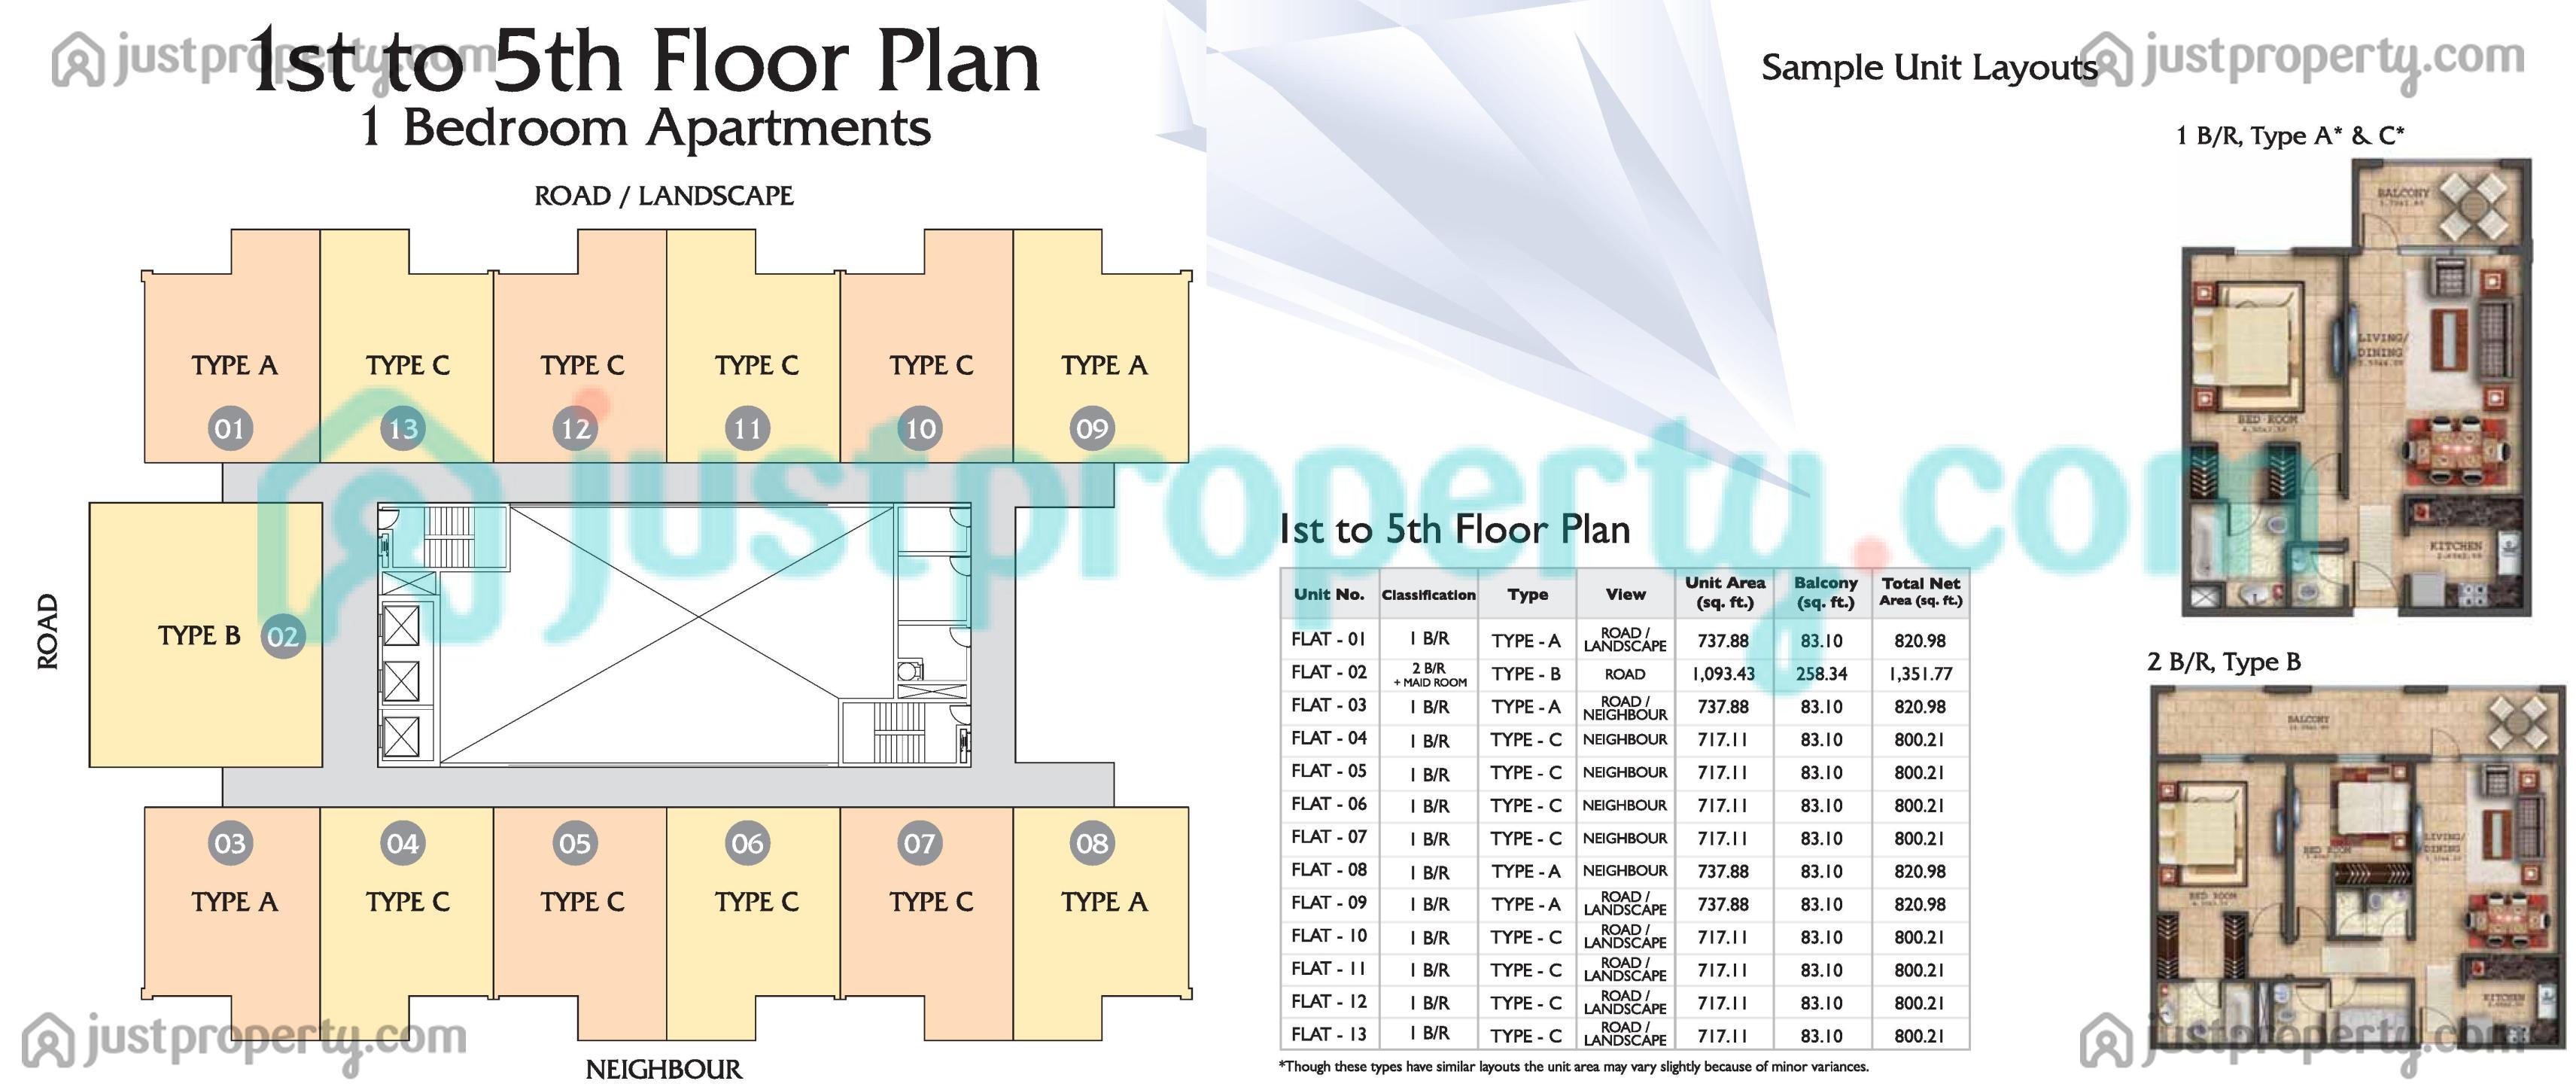 Sapphire Residence Floor Plans Justproperty Com